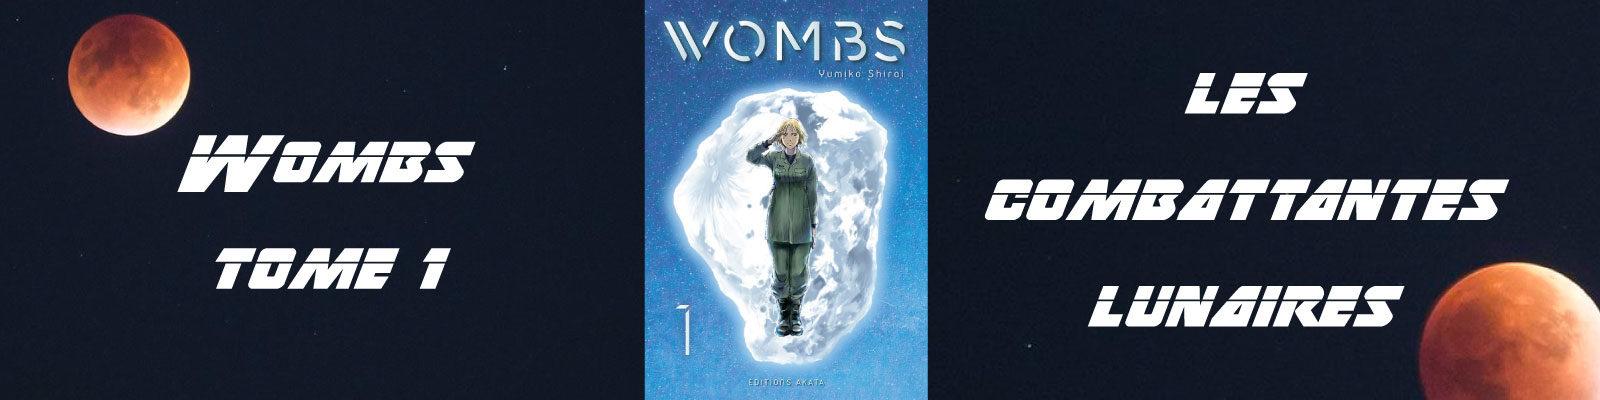 WOMBS-Vol.-1-2